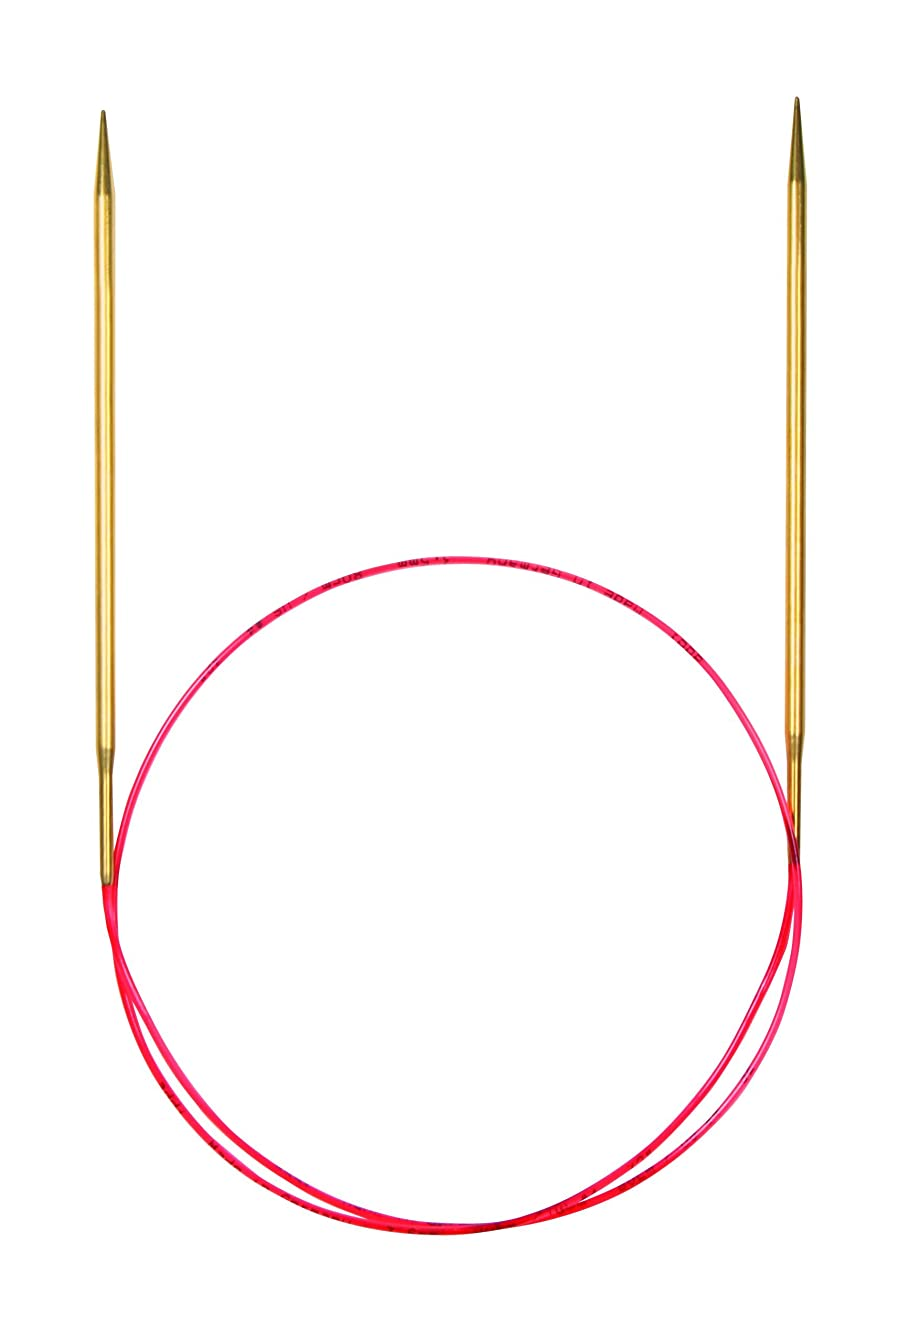 Addi 40 cm x 1.75 mm Circular Lace Needle